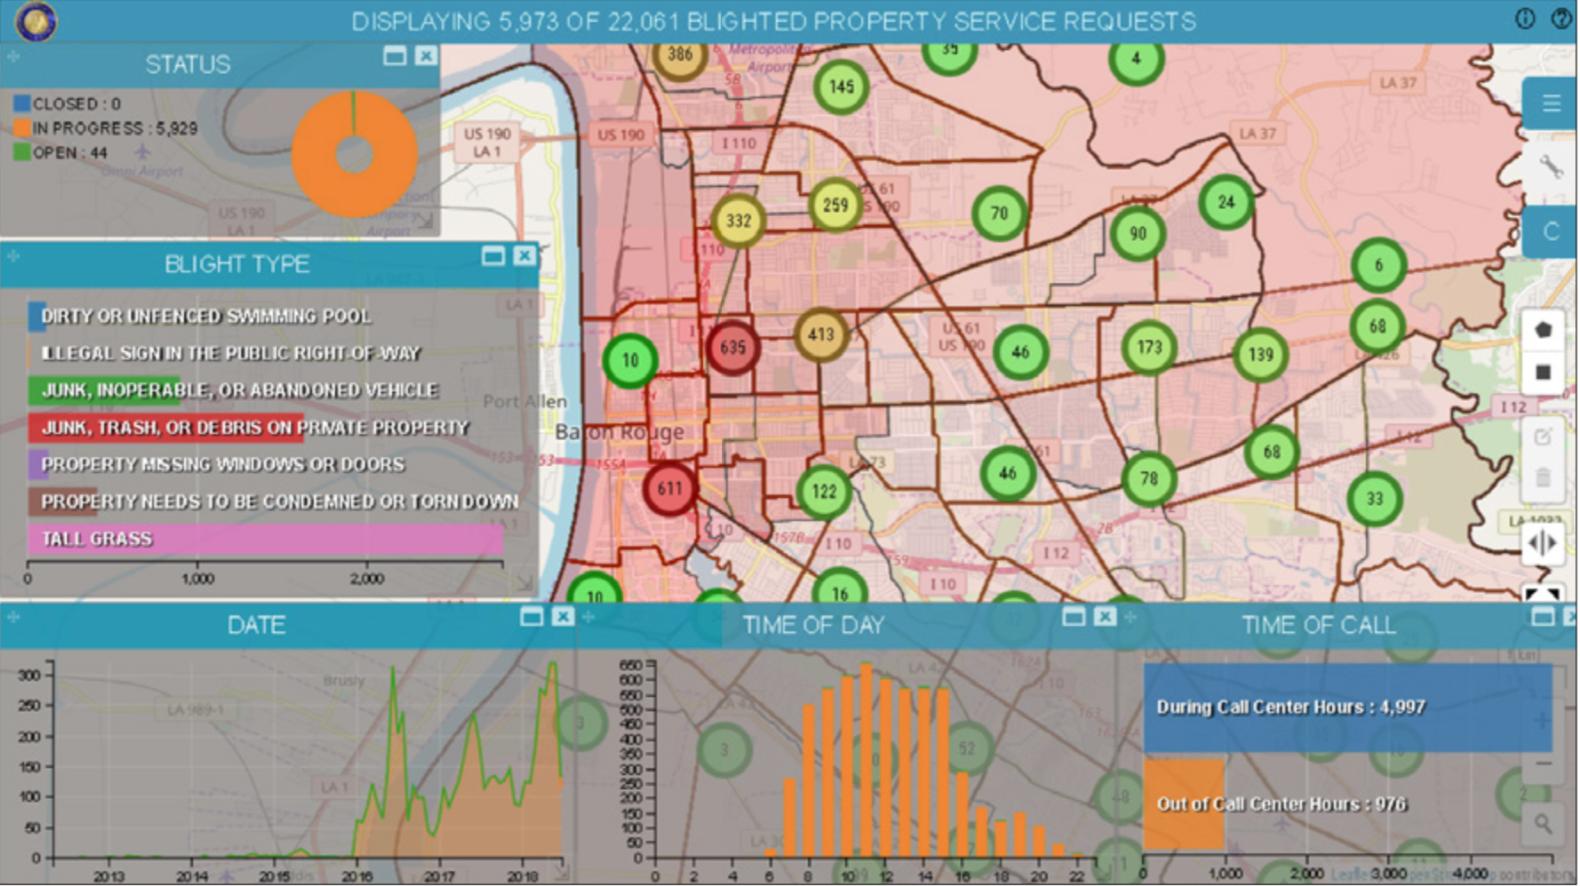 smart m.app blighted properties